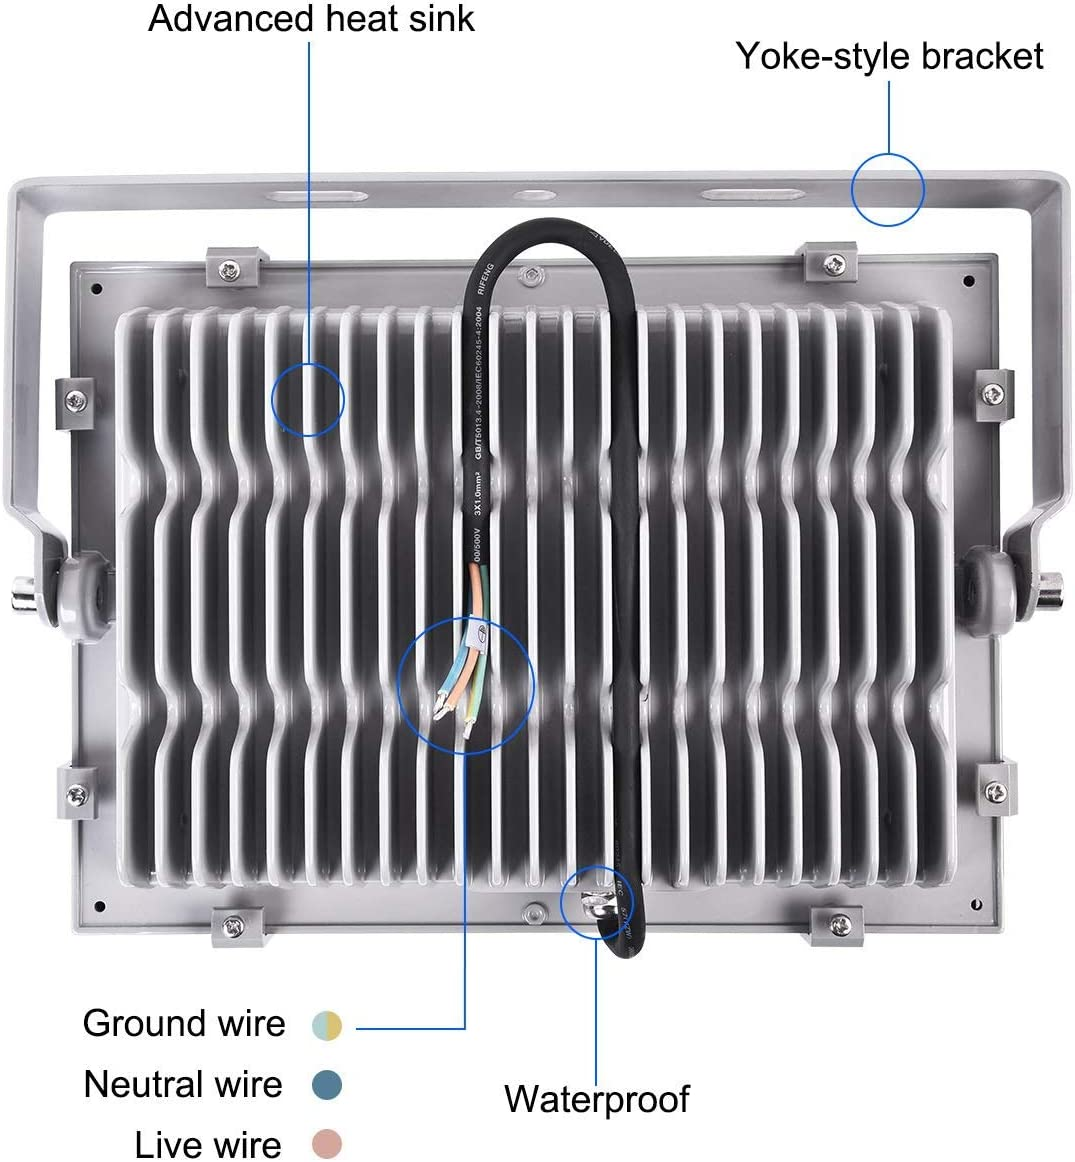 IP65 Impermeable Proyector led exterior,LED Focos Iluminaci/ón para Jard/ín,Garaje,Patio,Estadio. LED Floodlight 12000LM 3200k Viugreum 100W Foco LED Exterior Blanco C/álido